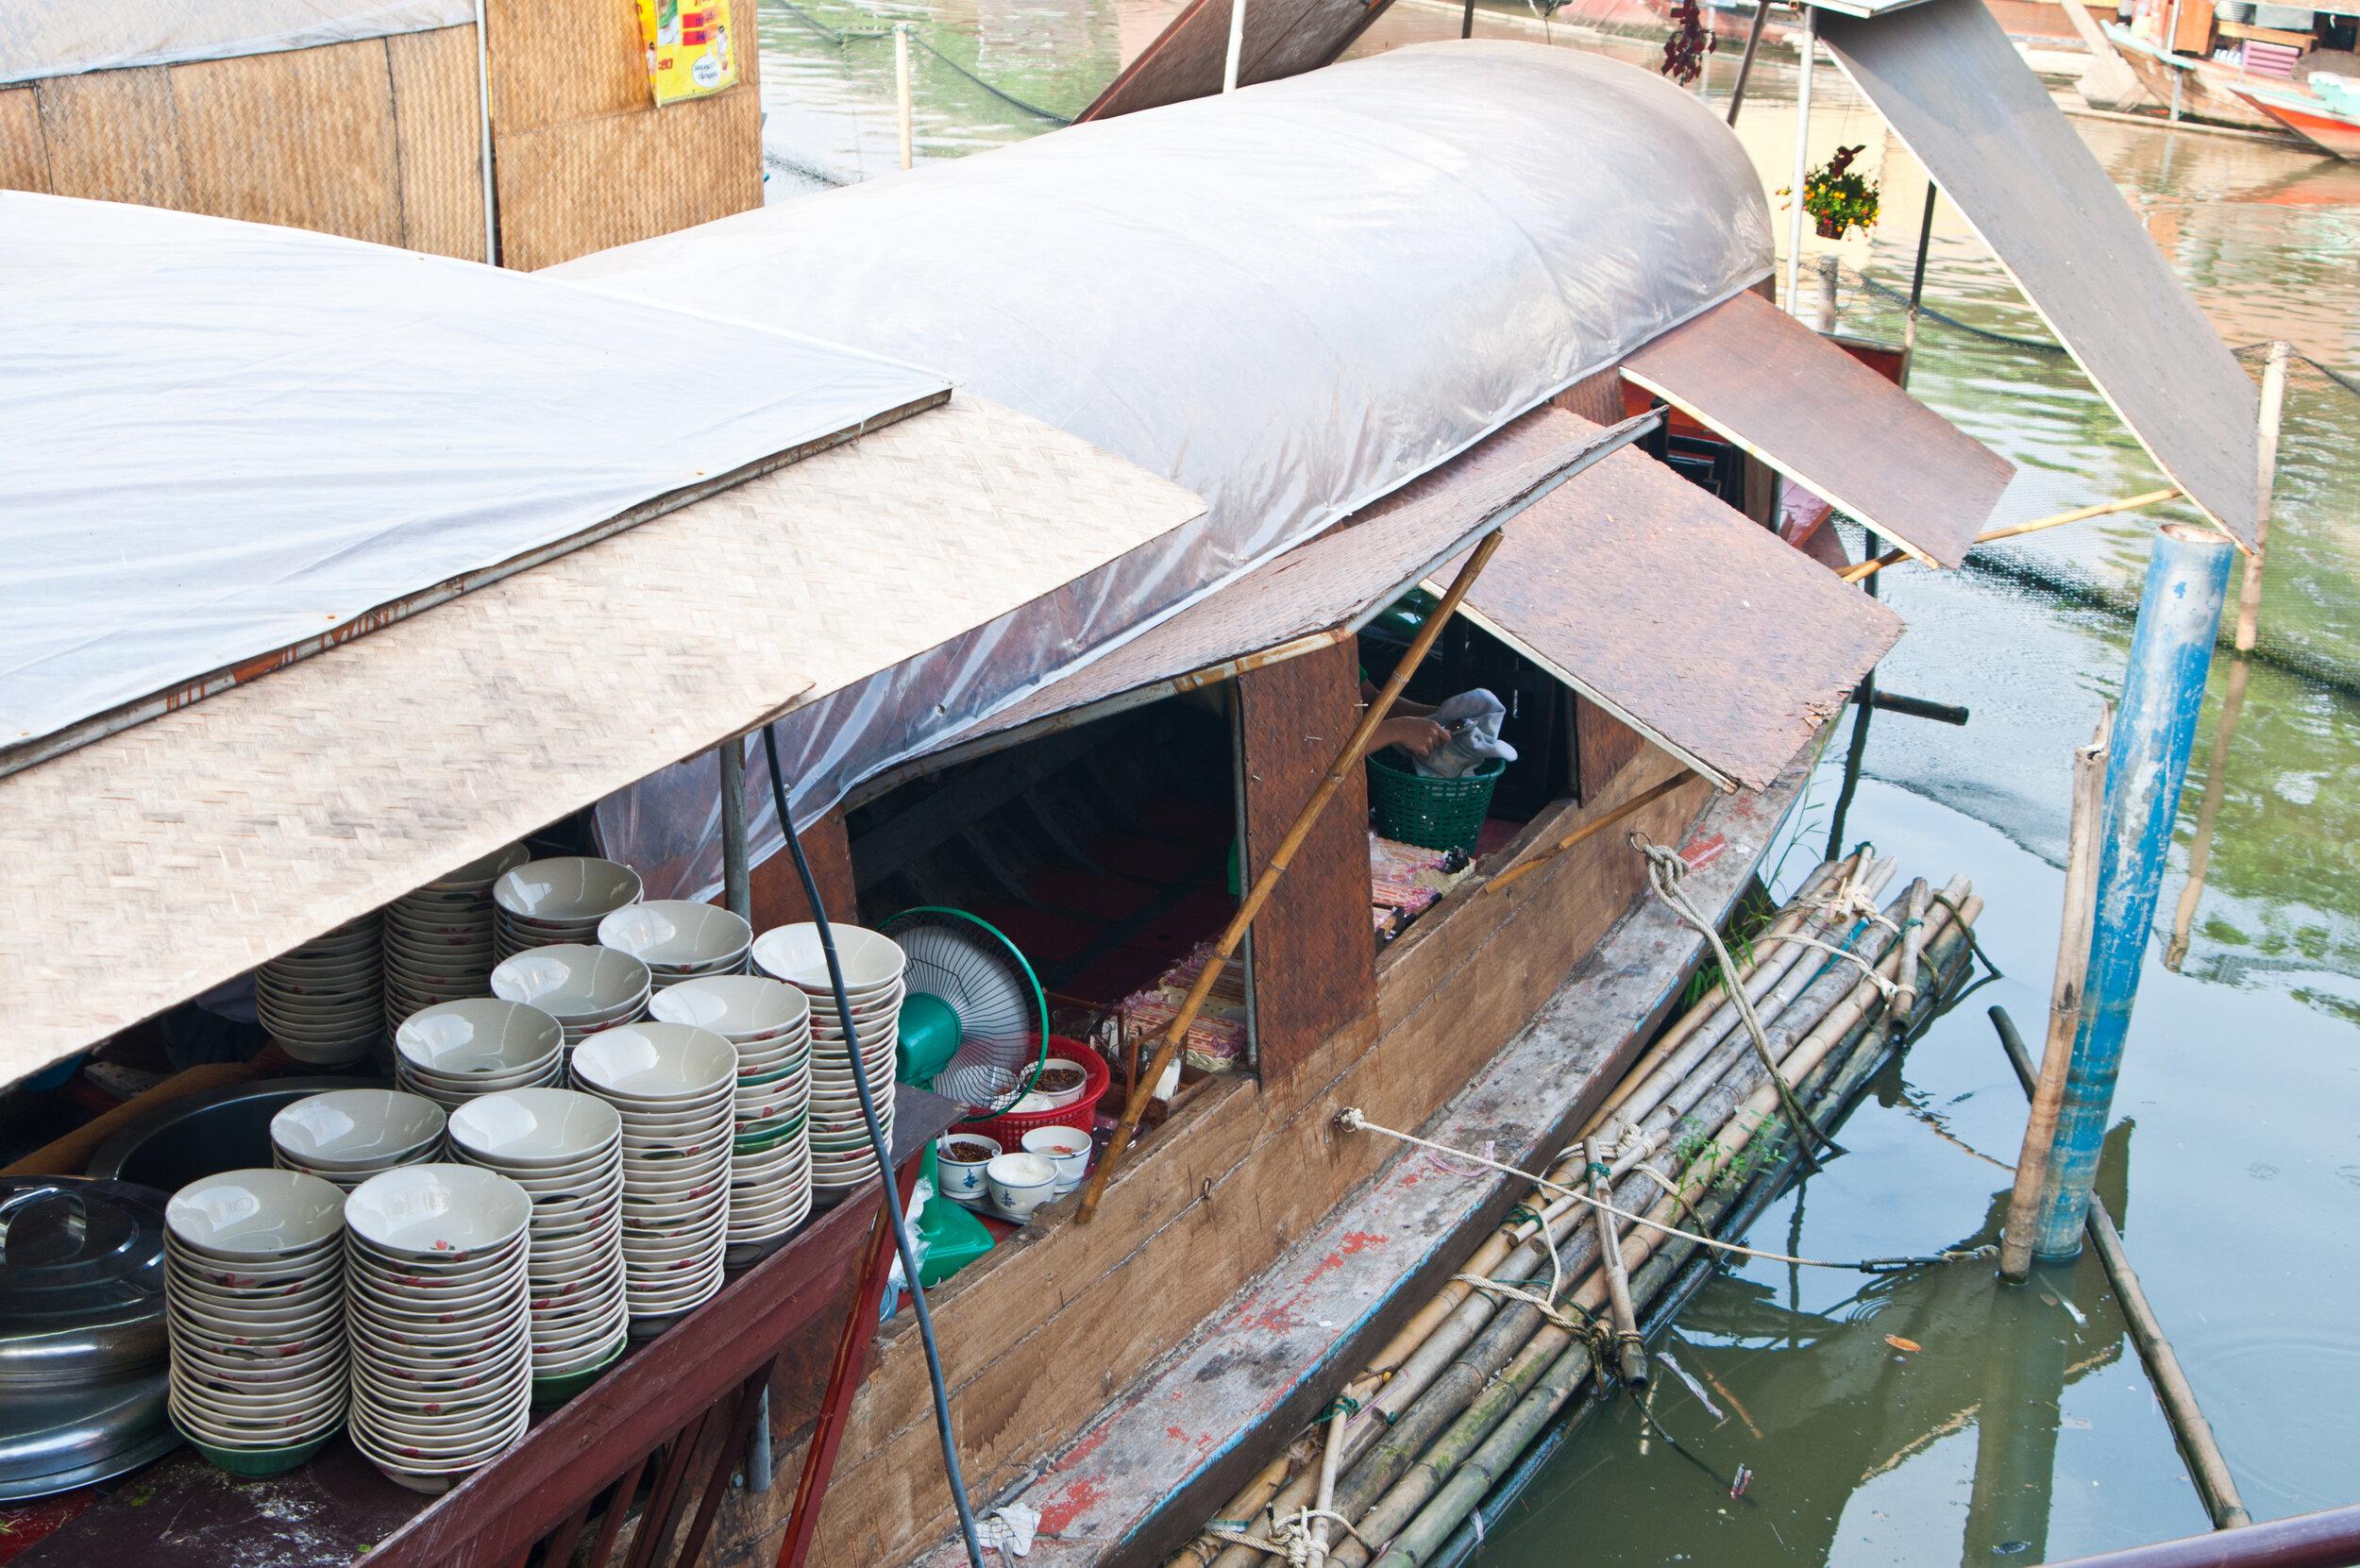 Thai street food sold off a boat in Bangkok.